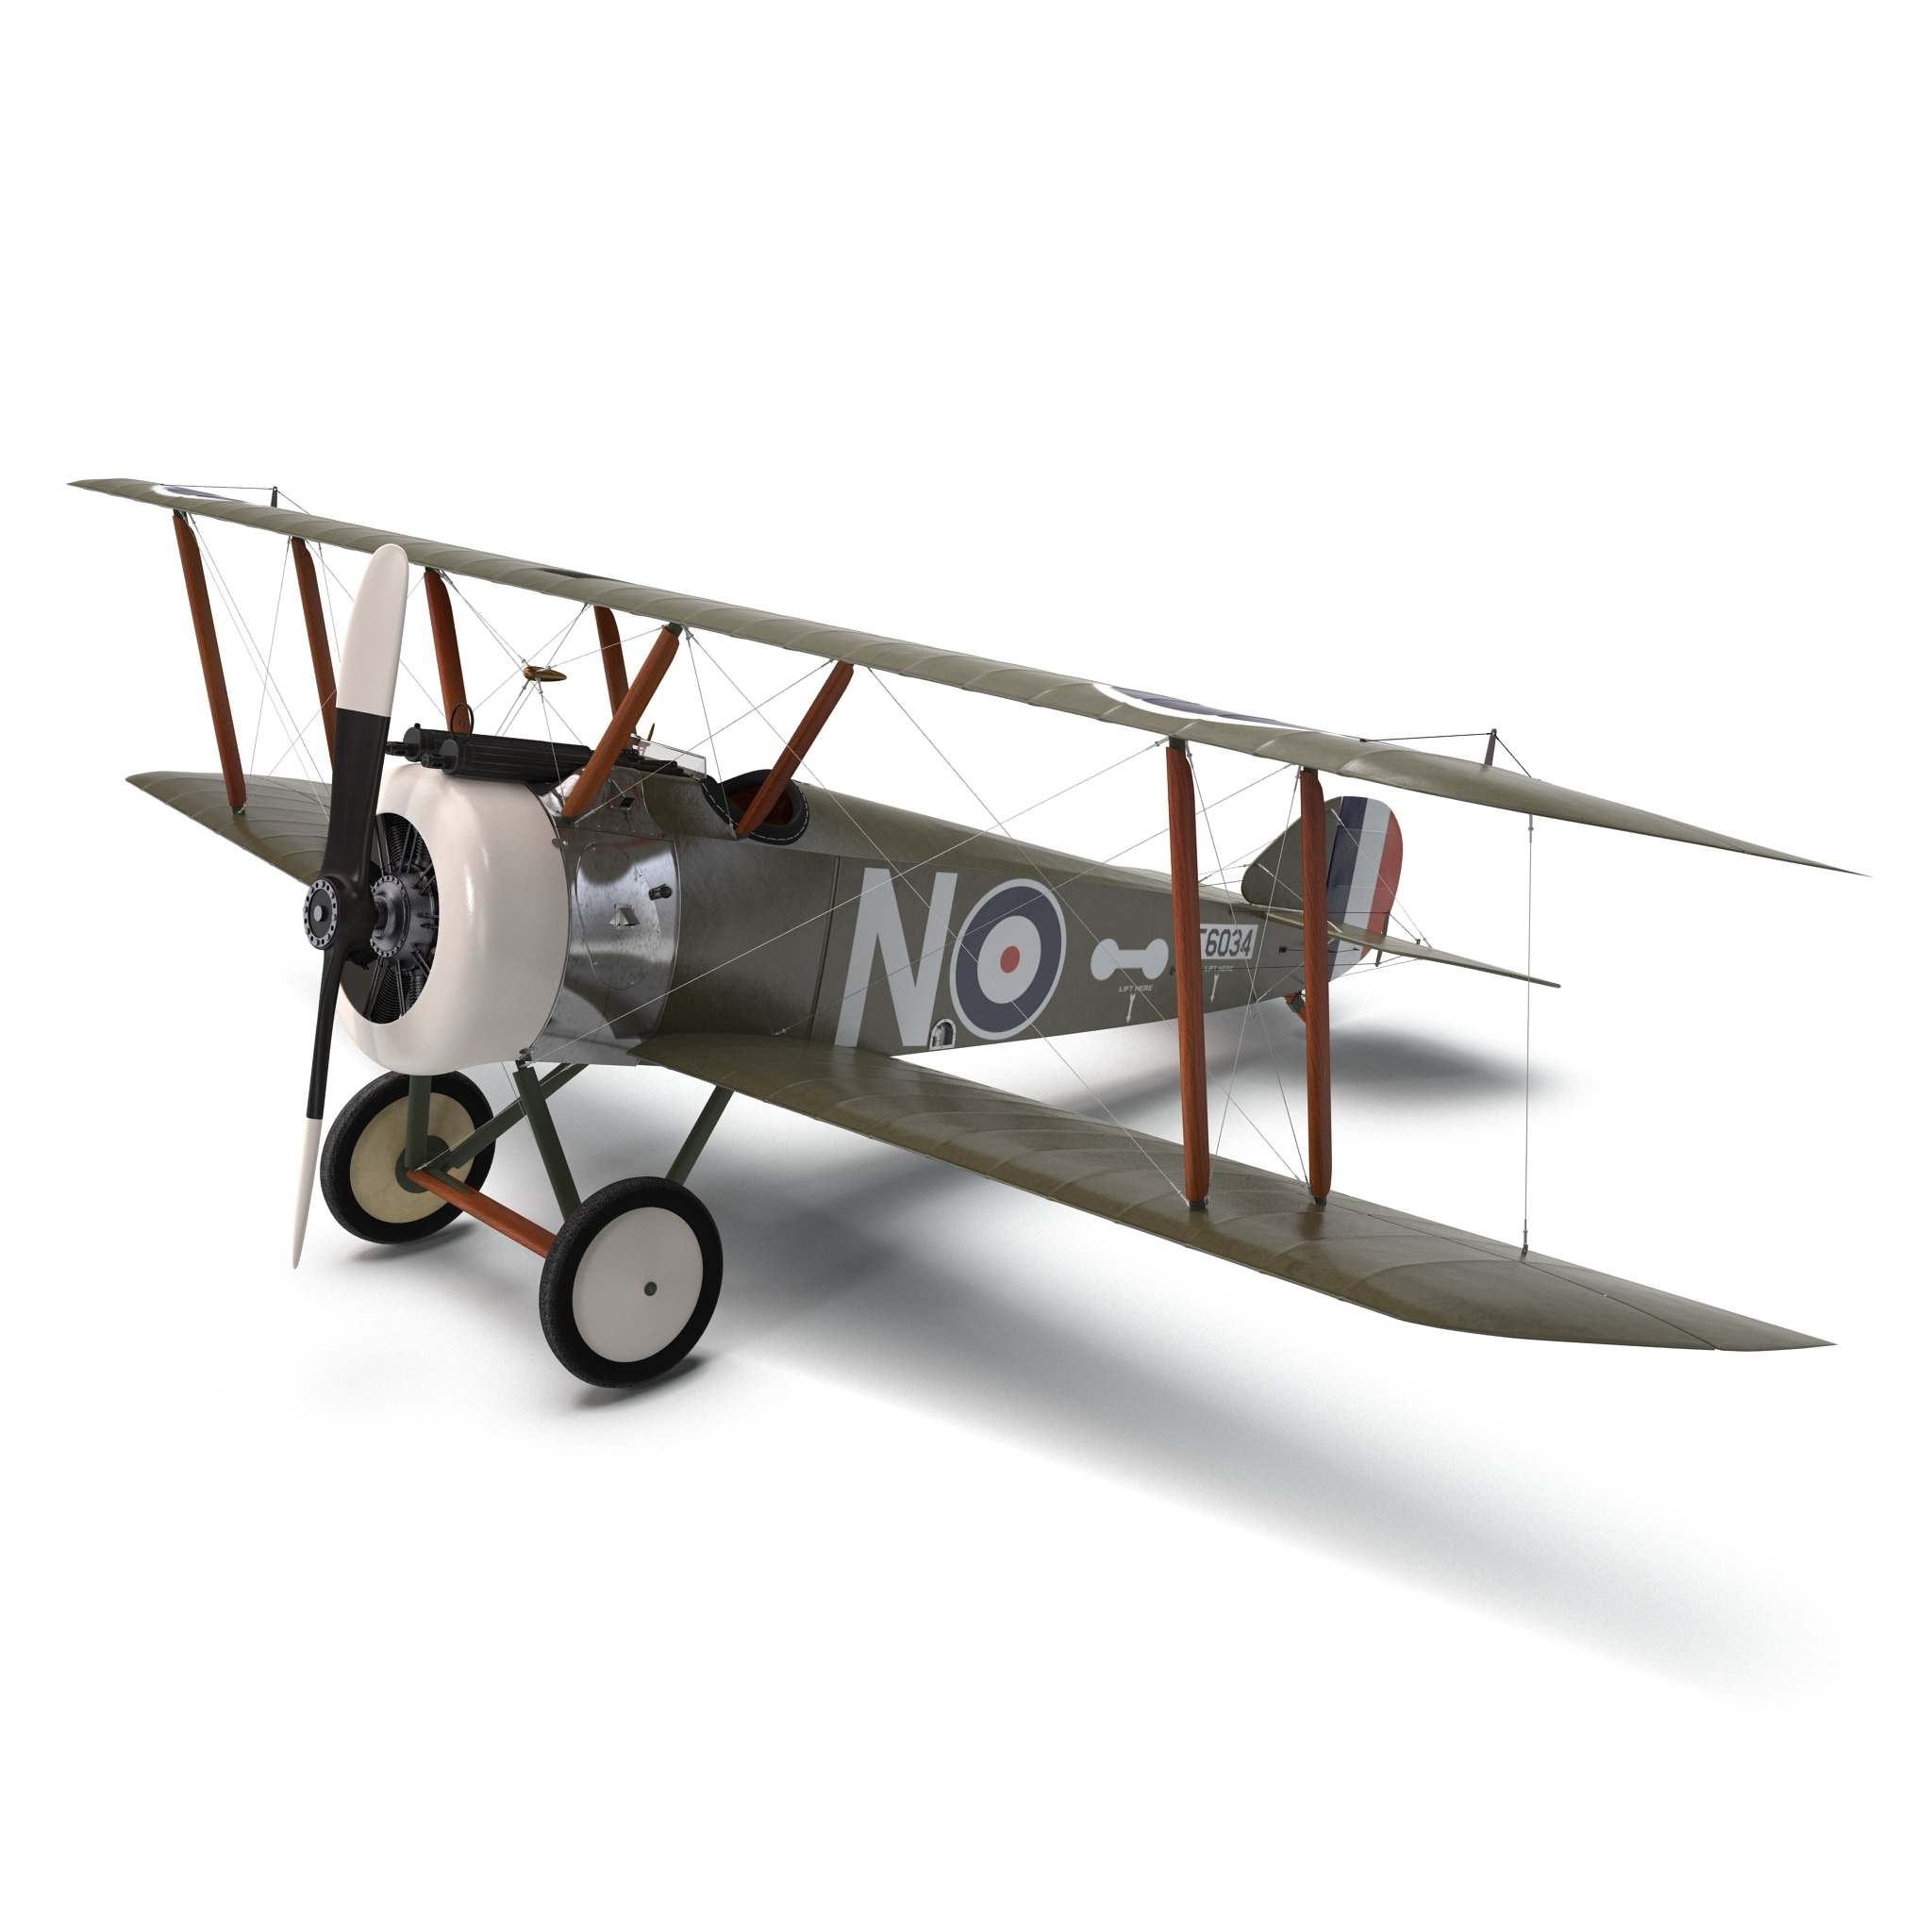 British WWI Biplane Fighter Sopwith F1 Camel_105.jpg